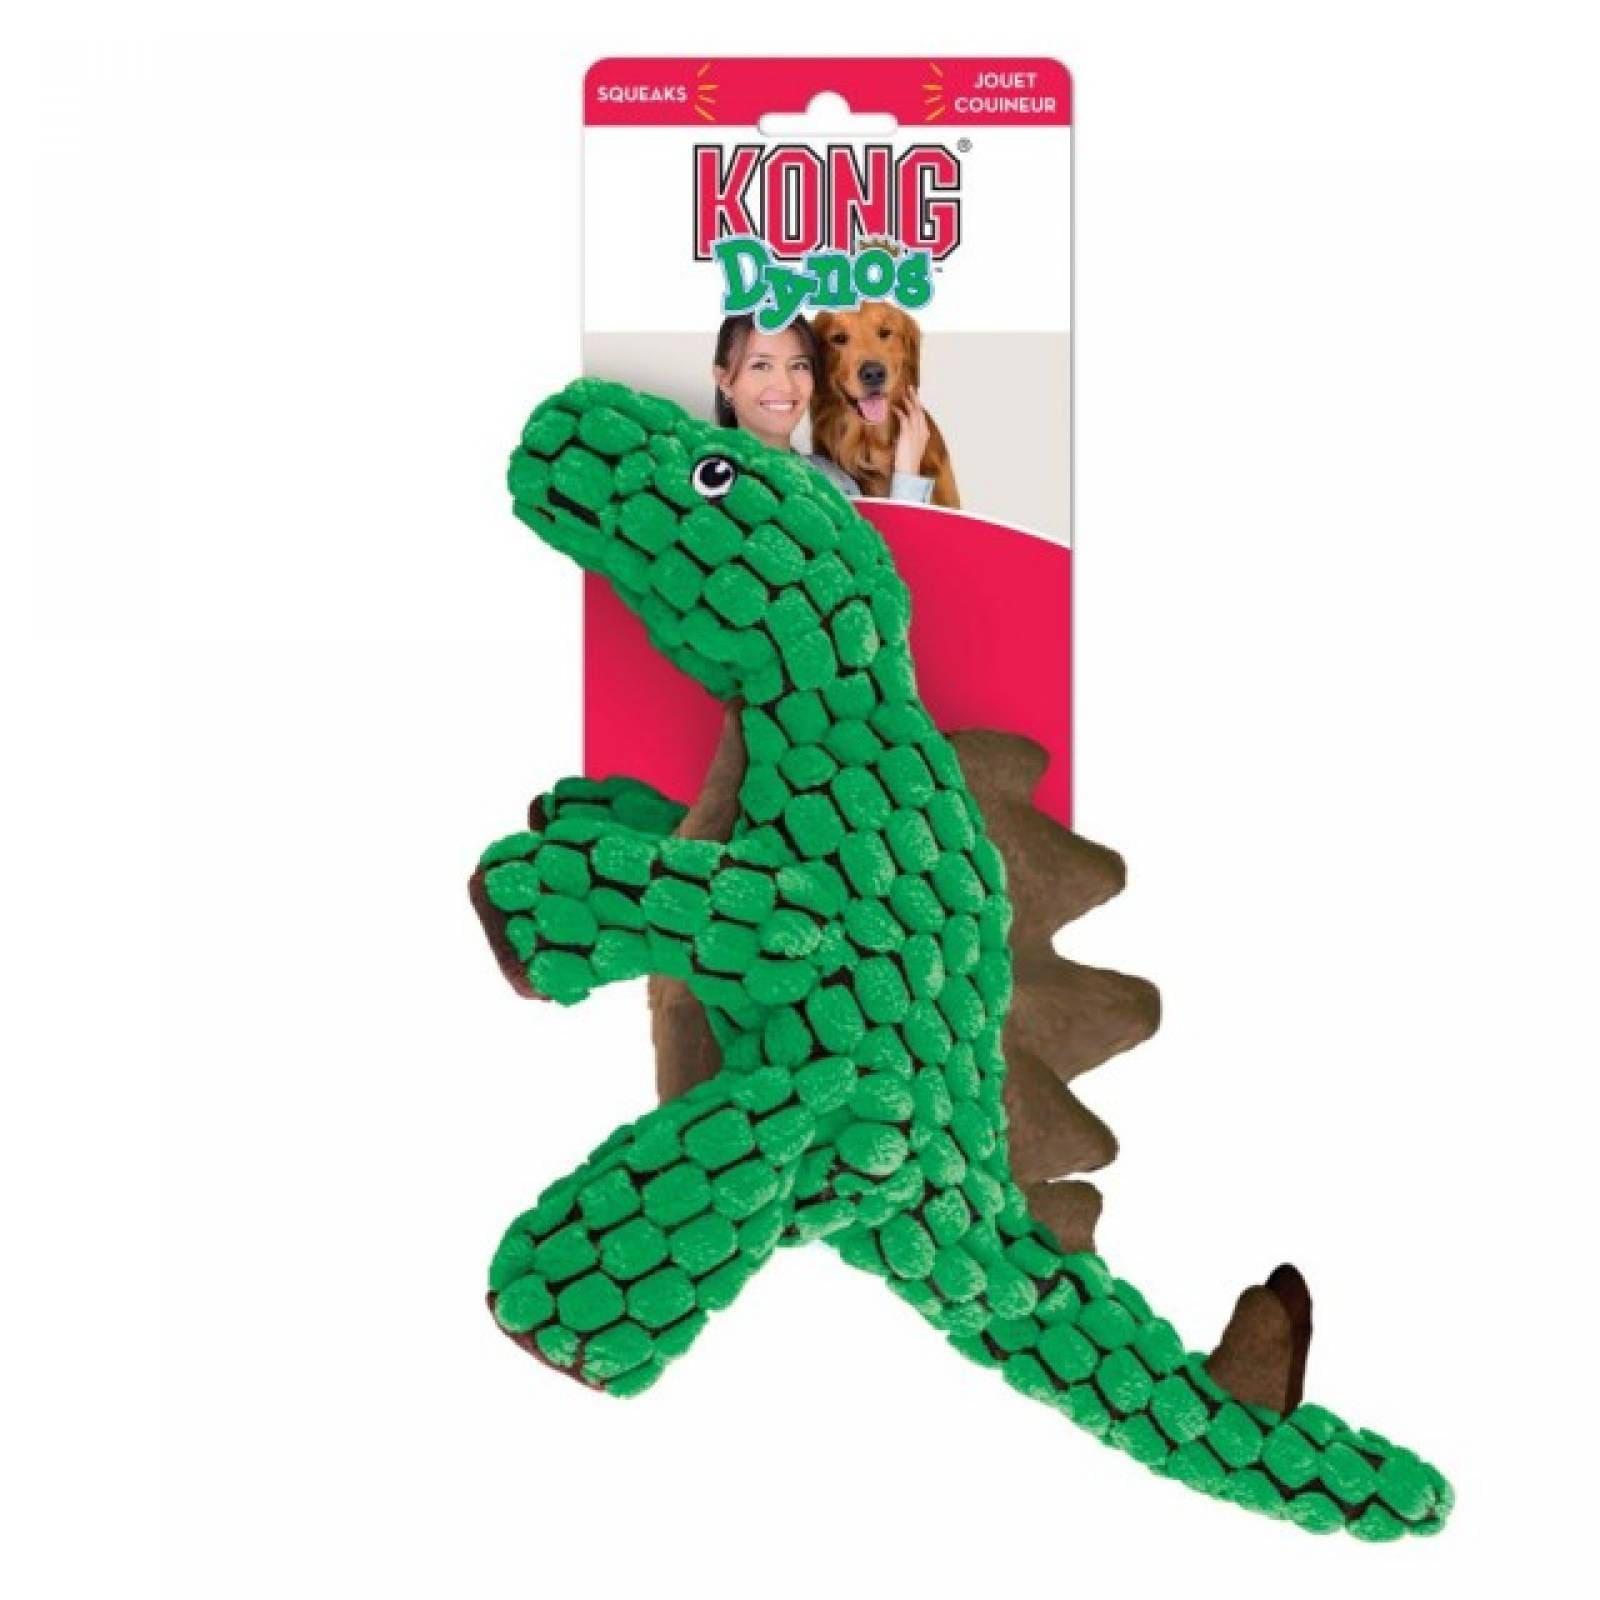 Kong Dyno Peluche para Perro Stegosaurio Verde ch